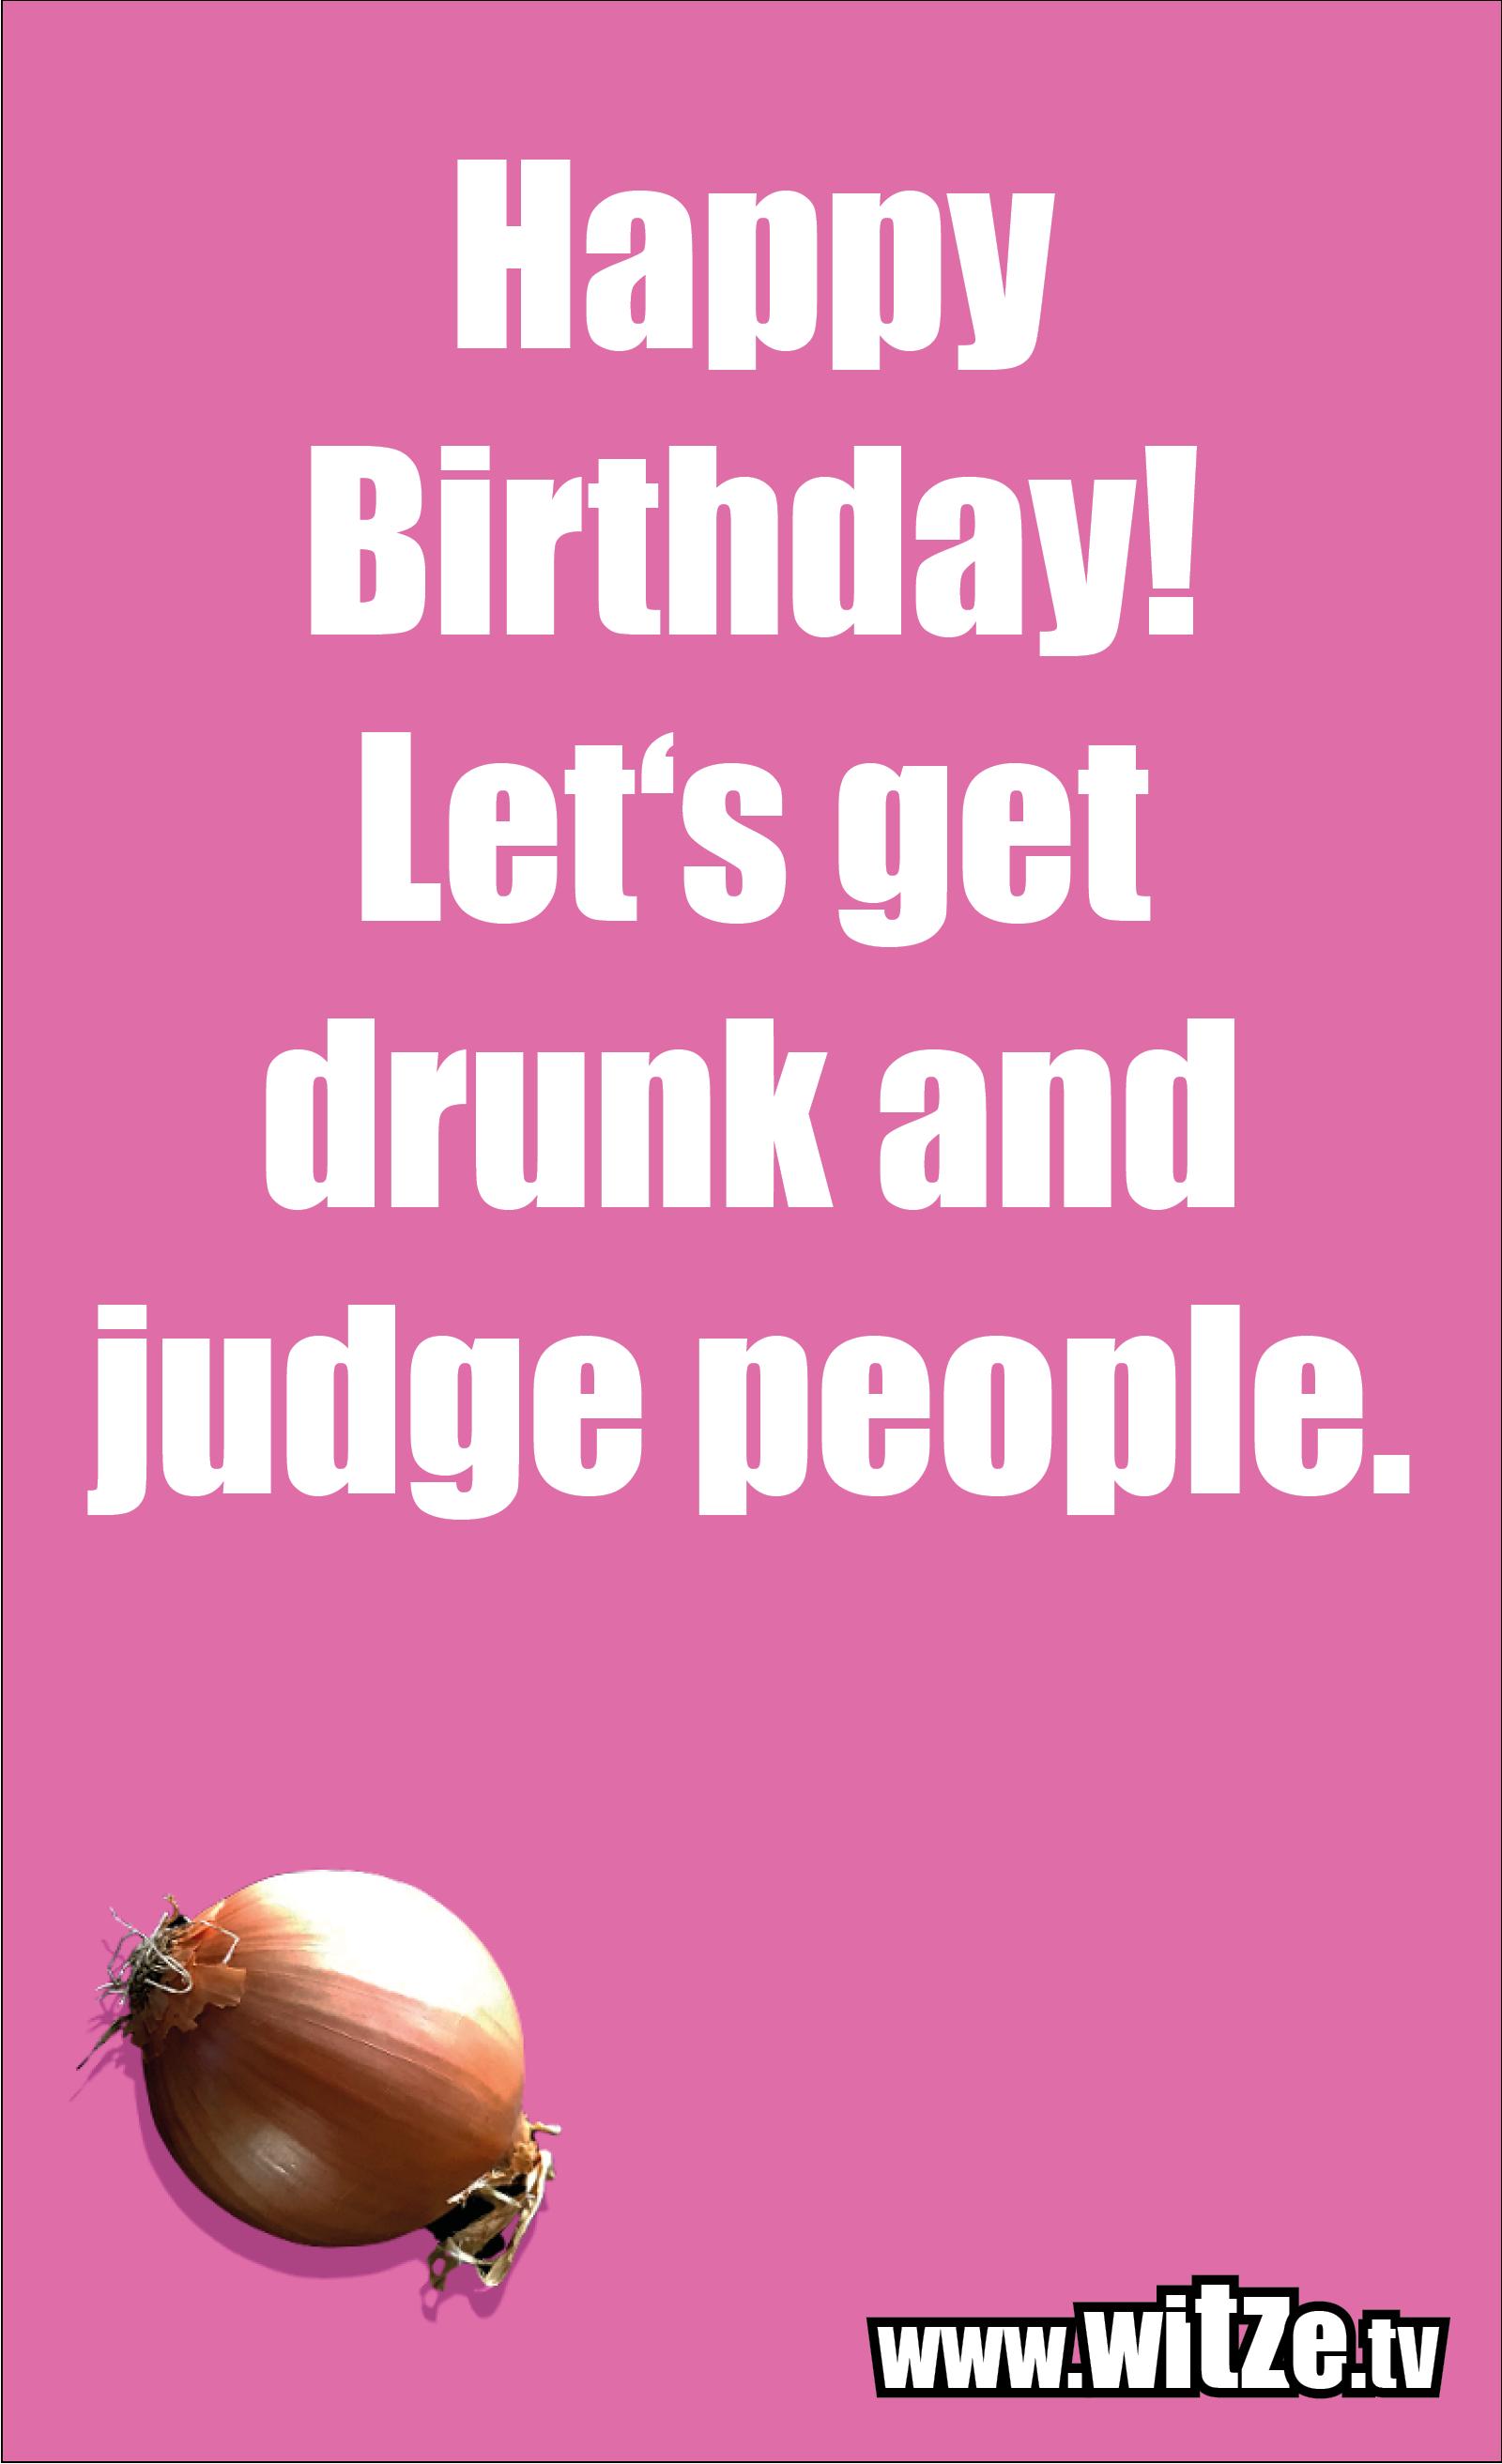 Lustige Geburtstagswünsche: Happy Birthday! Let's get drunk and judge people.